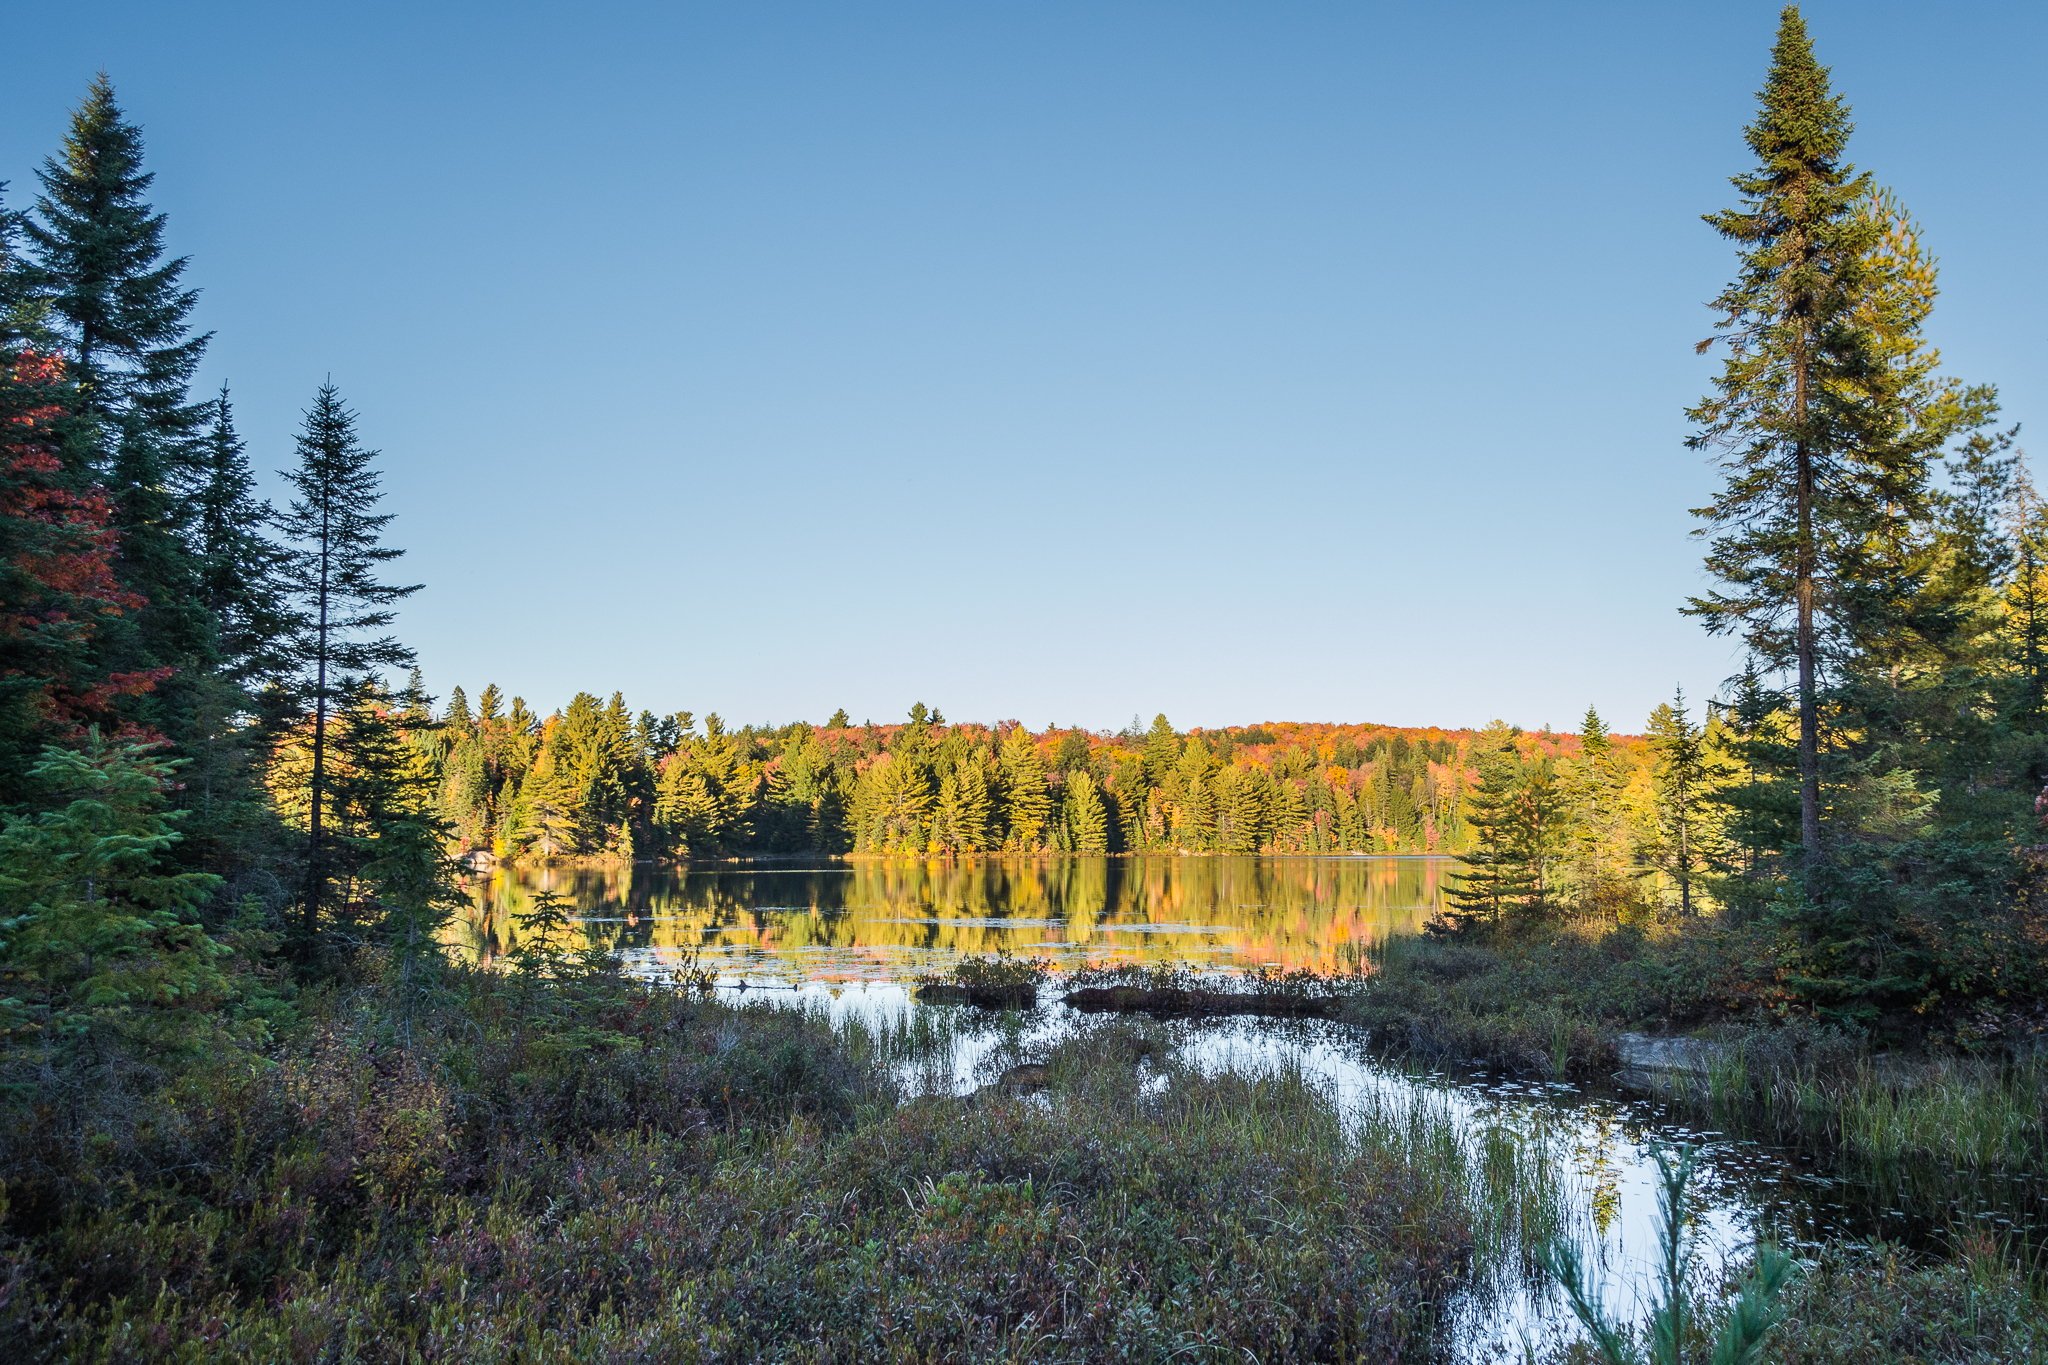 Peck Lake (1/160s, f/6.3, ISO400)